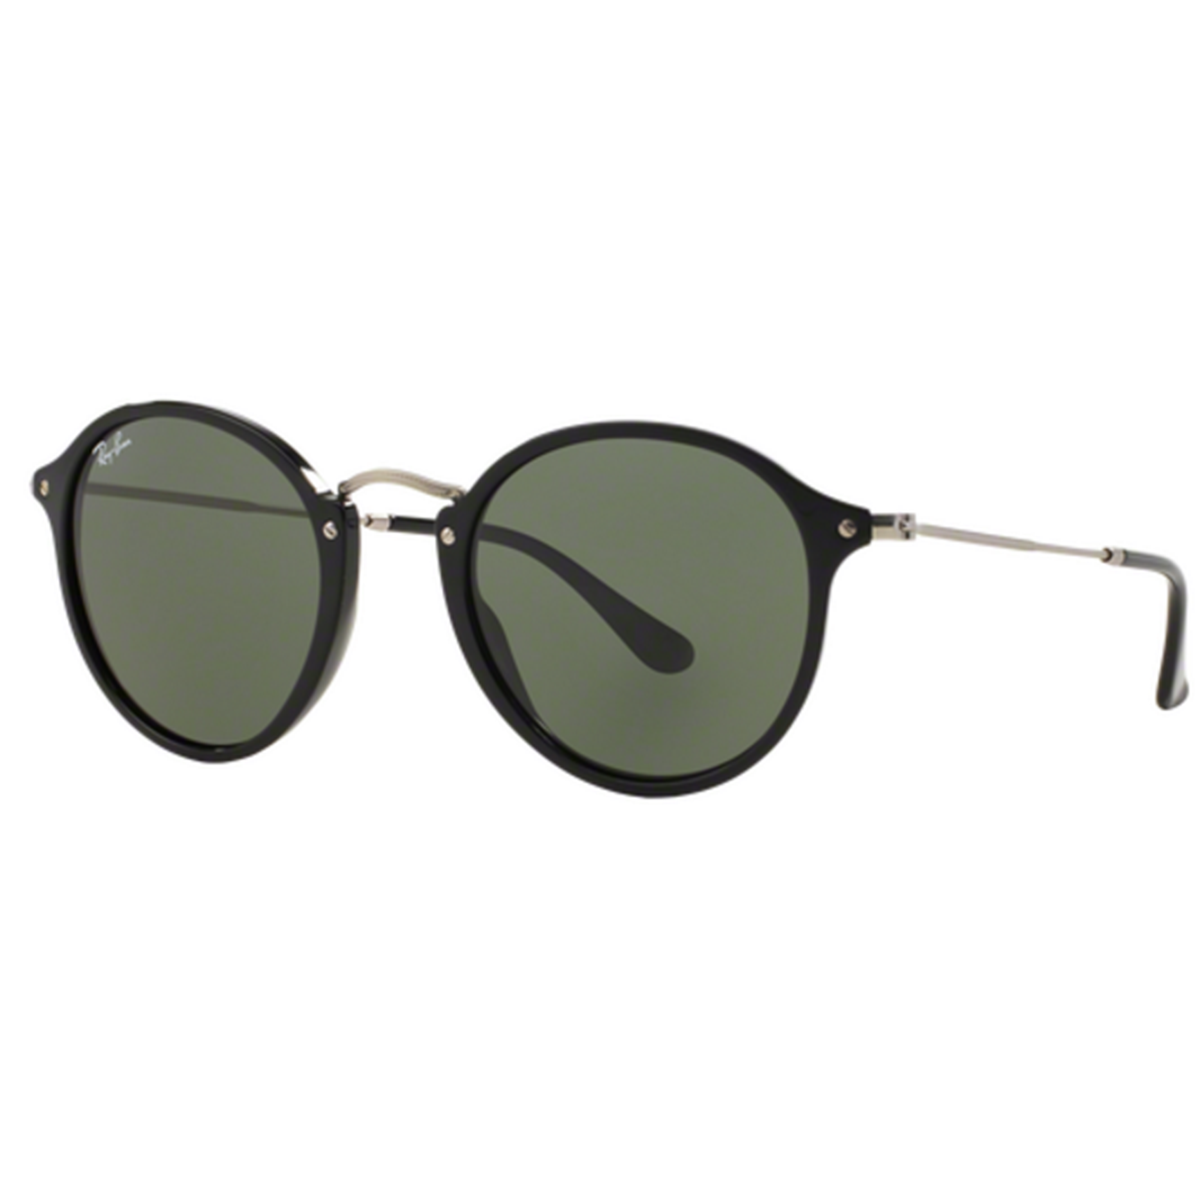 Compre Óculos de Sol Ray Ban Round Fleck em 10X   Tri-Jóia Shop 1472c6a8c2